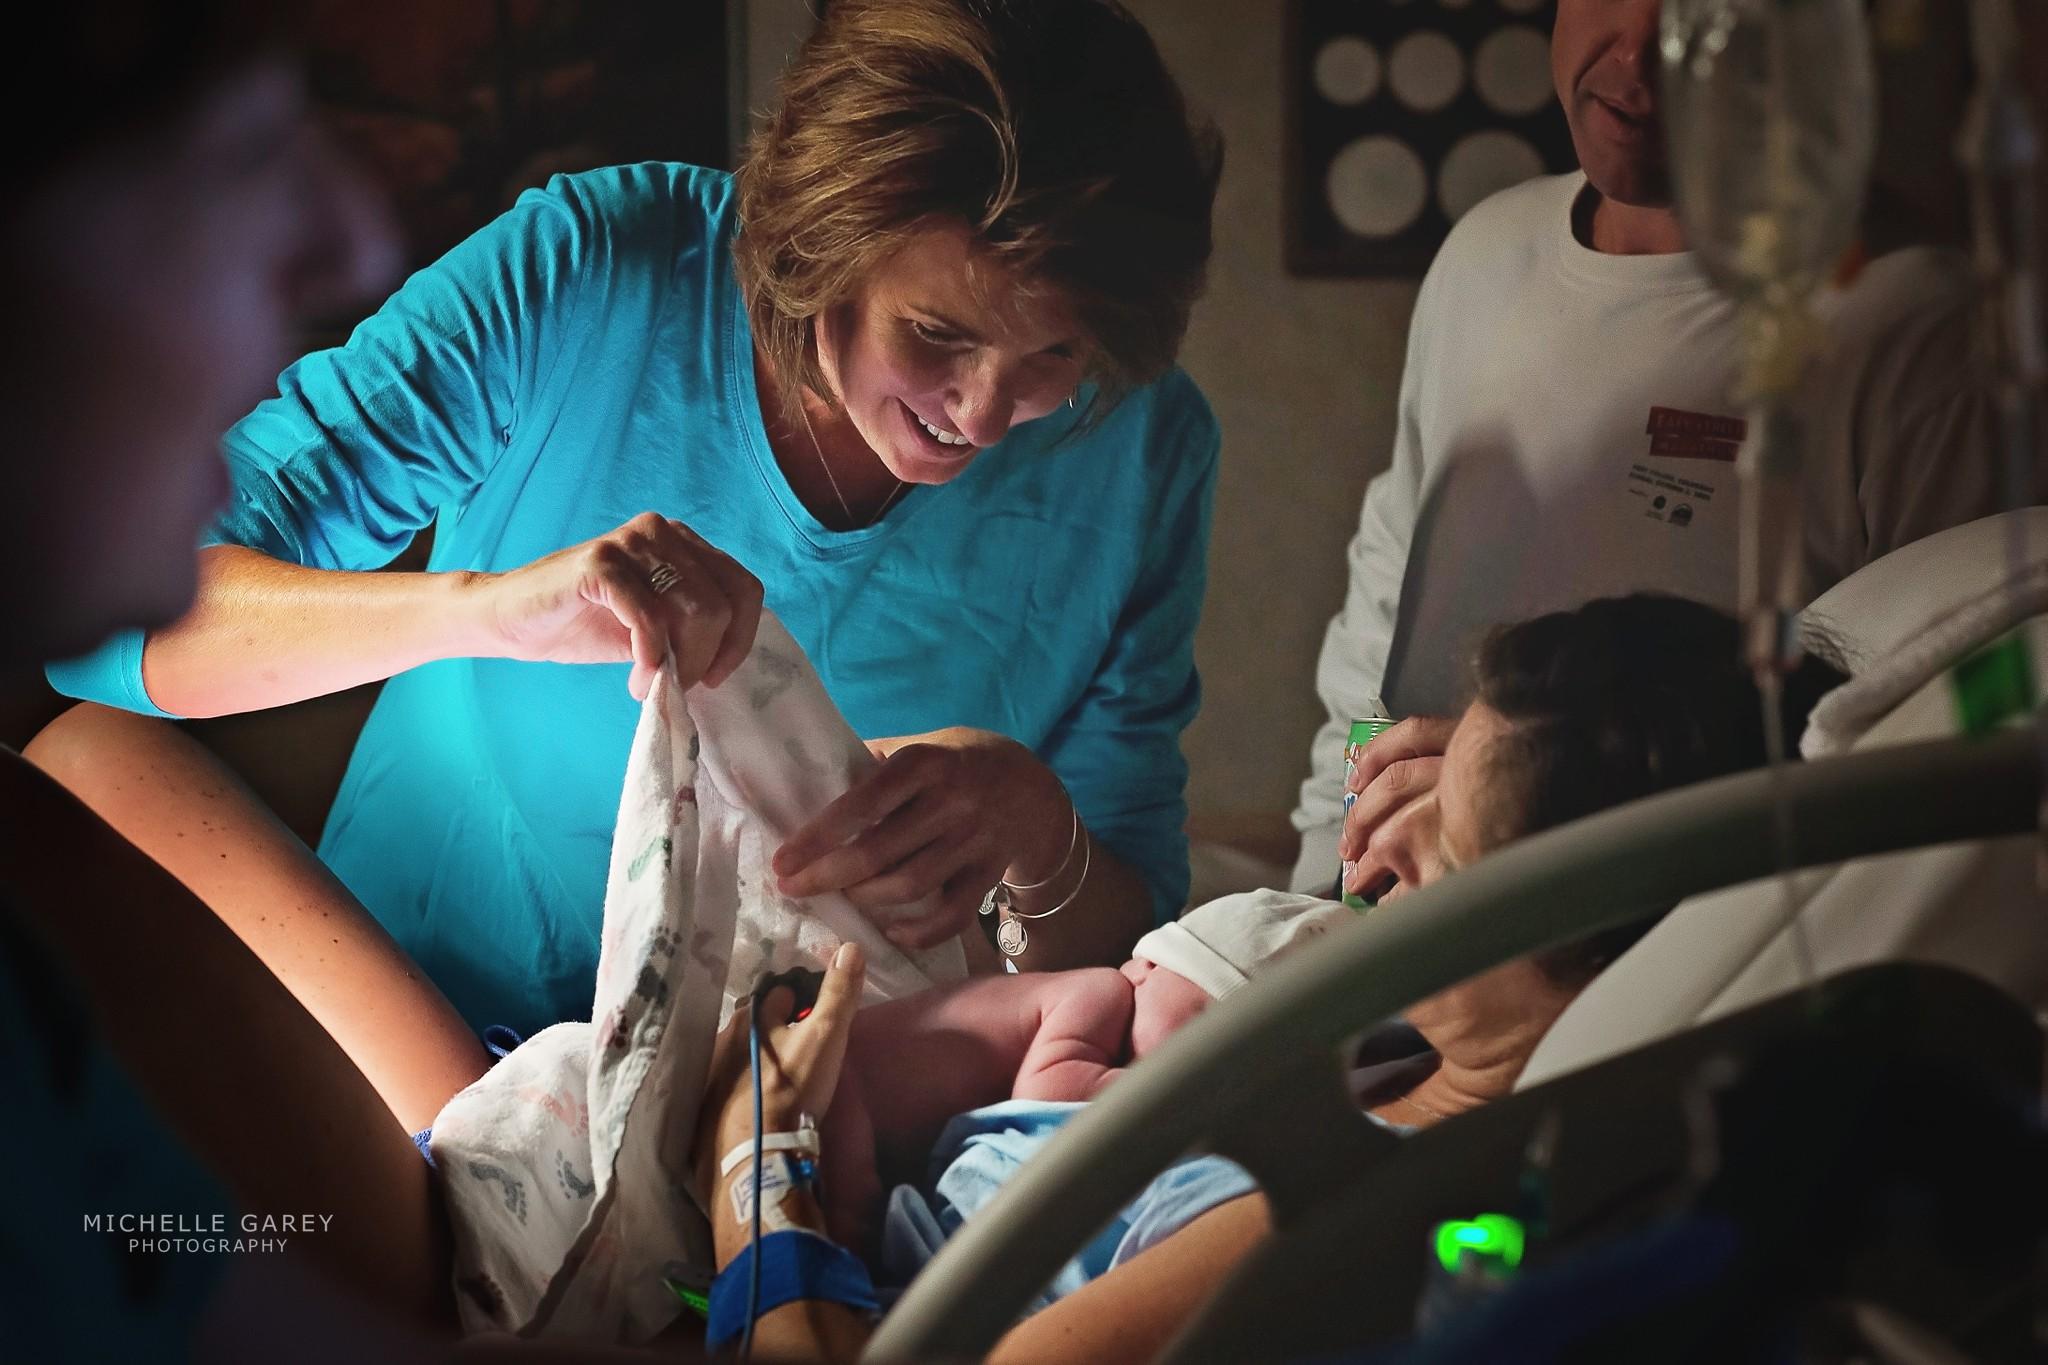 Jennifer Ivans - Beautiful Beginnings Birth Services970.420.8999http://beautifulbeginningsllc.com/